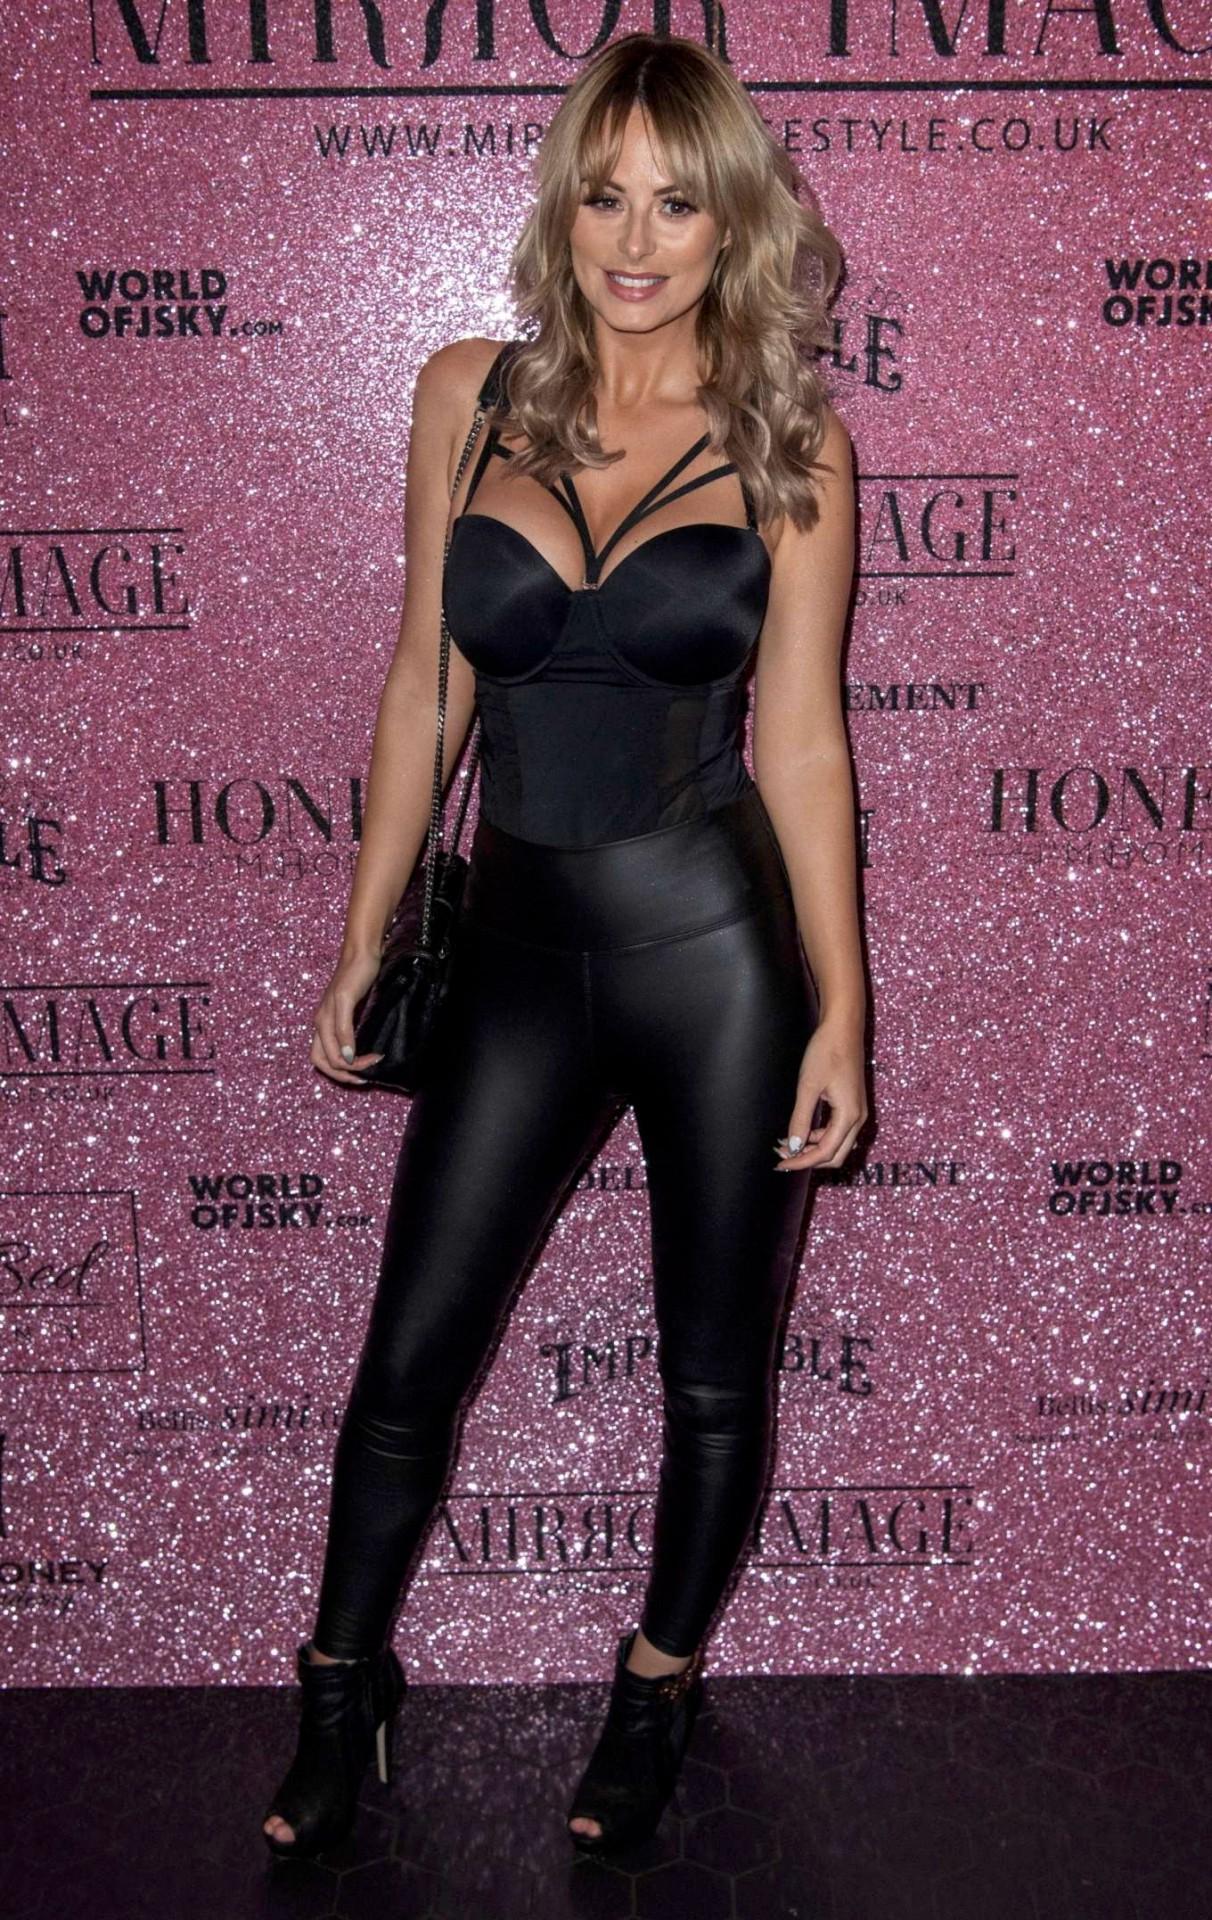 Rhian Sugden - Big Boobs at Mirror-Image Fashion Event in